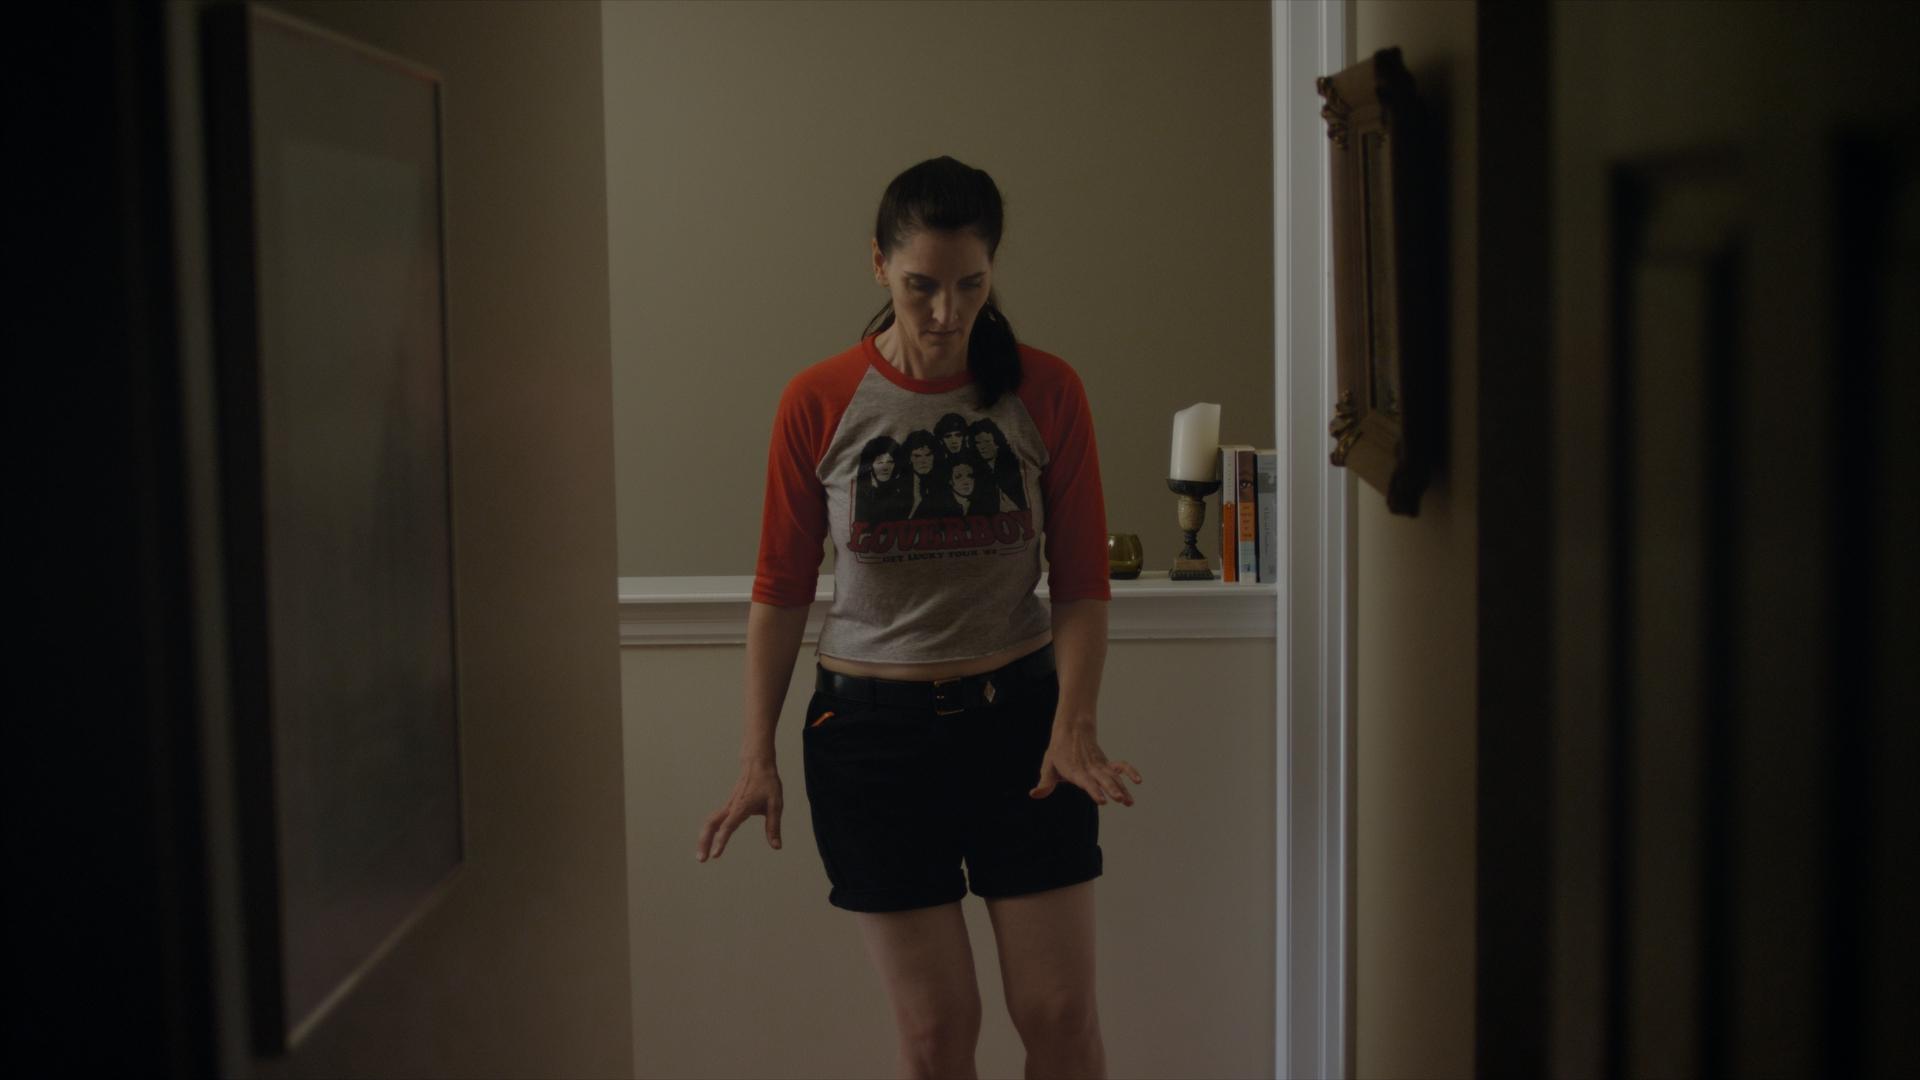 Sis Boom Bah (series) - First Cleaning Gig episode  Director: Trevor Juras Starring: Delphine Roussel Producer: Delphine Roussel